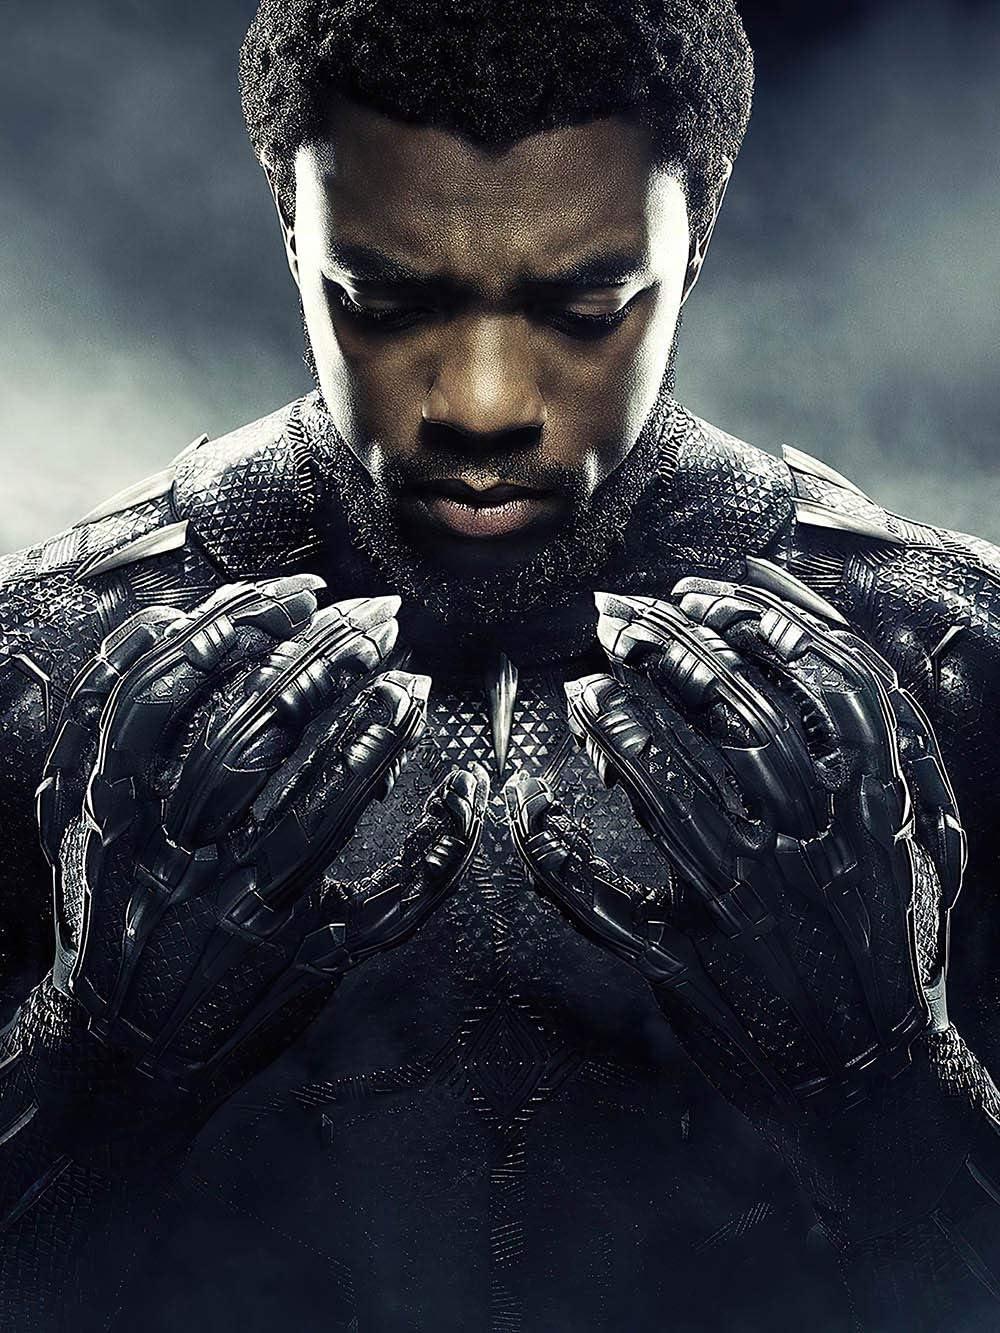 Superhero Ranking integrated 1st place Ranking TOP11 Black Panther Chadwick Boseman Canvas HD posters Print